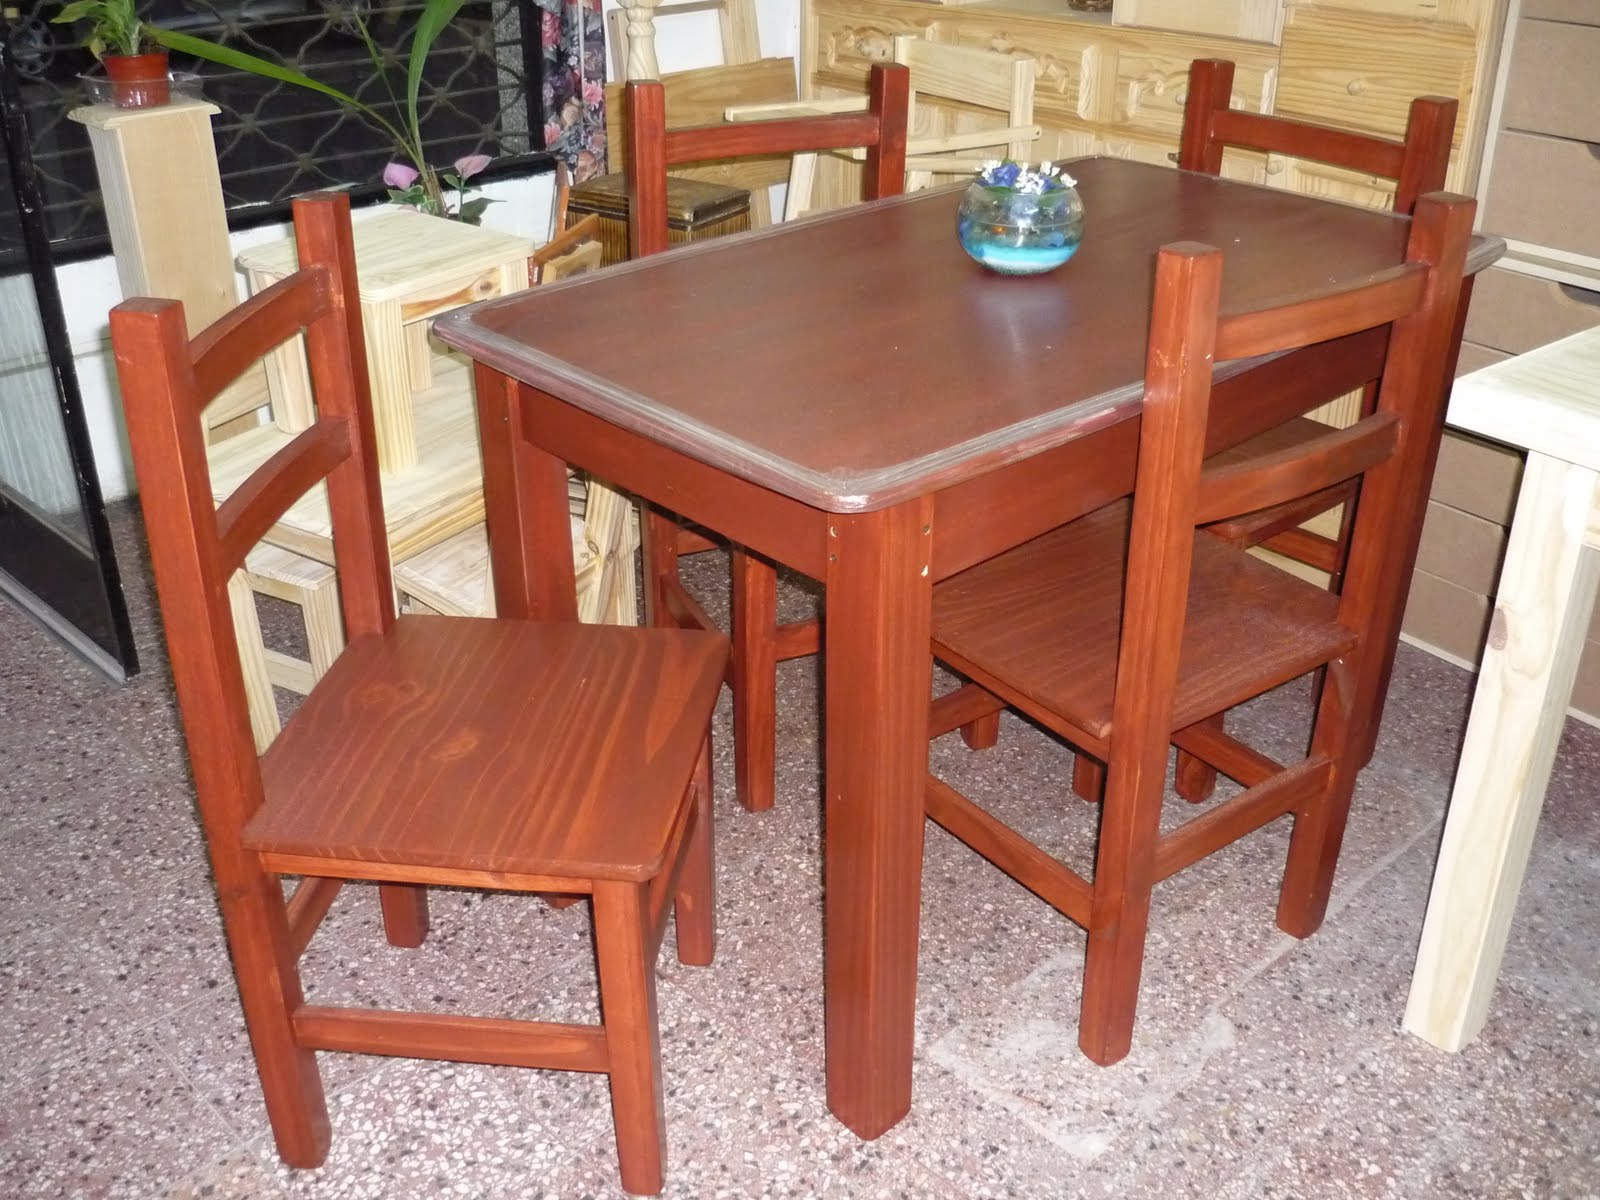 HyA - MUEBLES DE PINO: Muebles teñidos